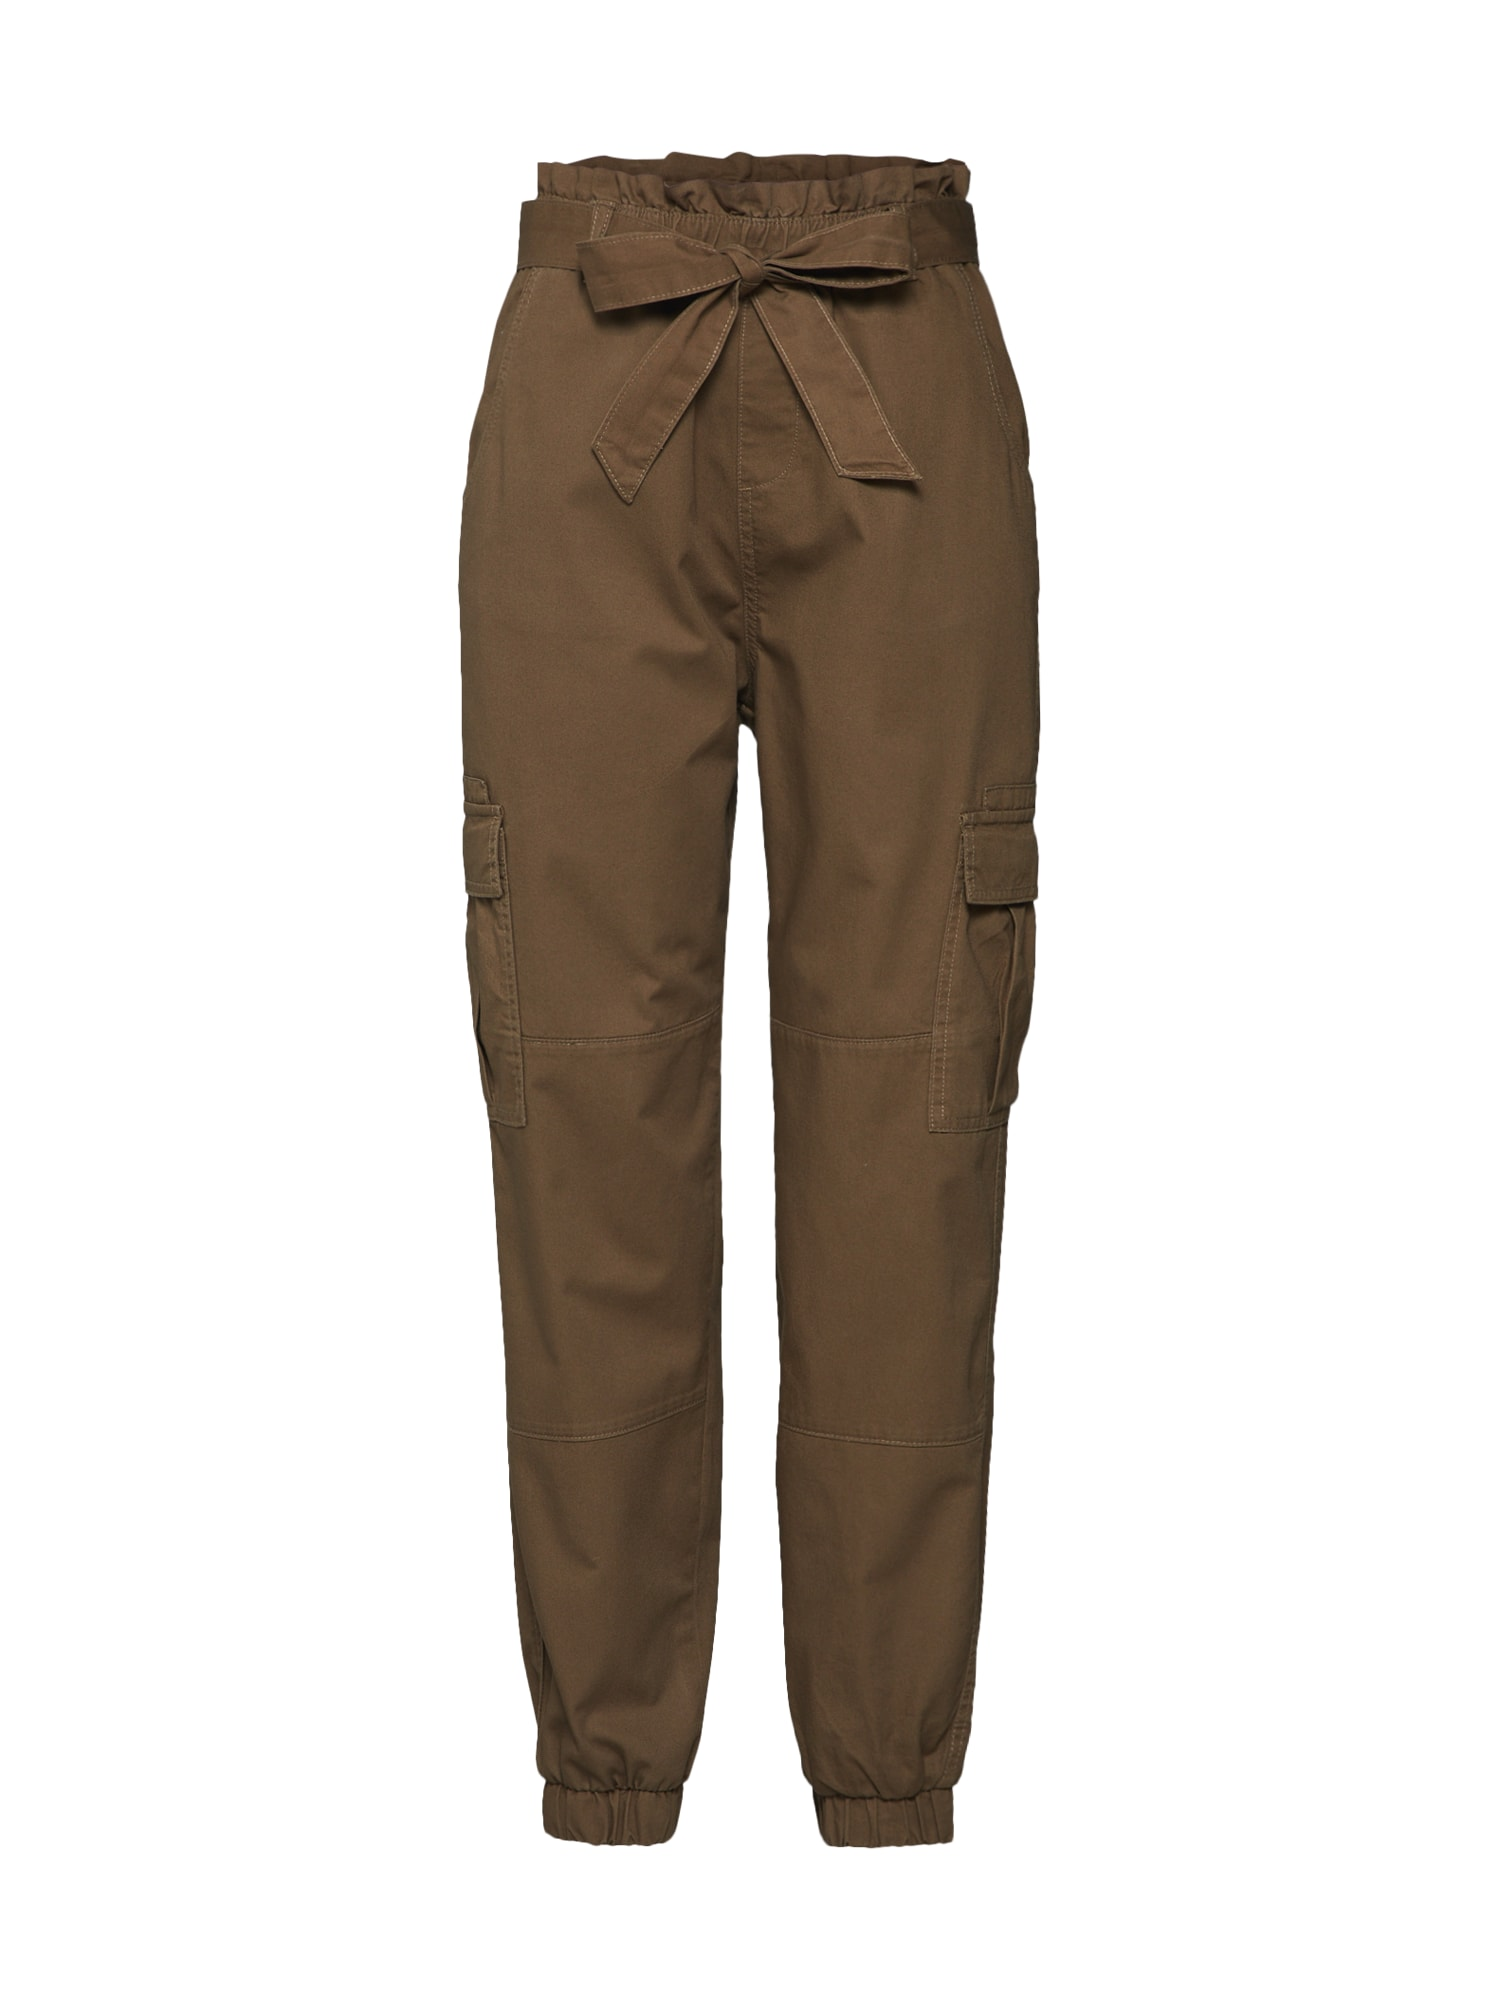 Kalhoty se sklady v pase Miles Ancle khaki ONLY